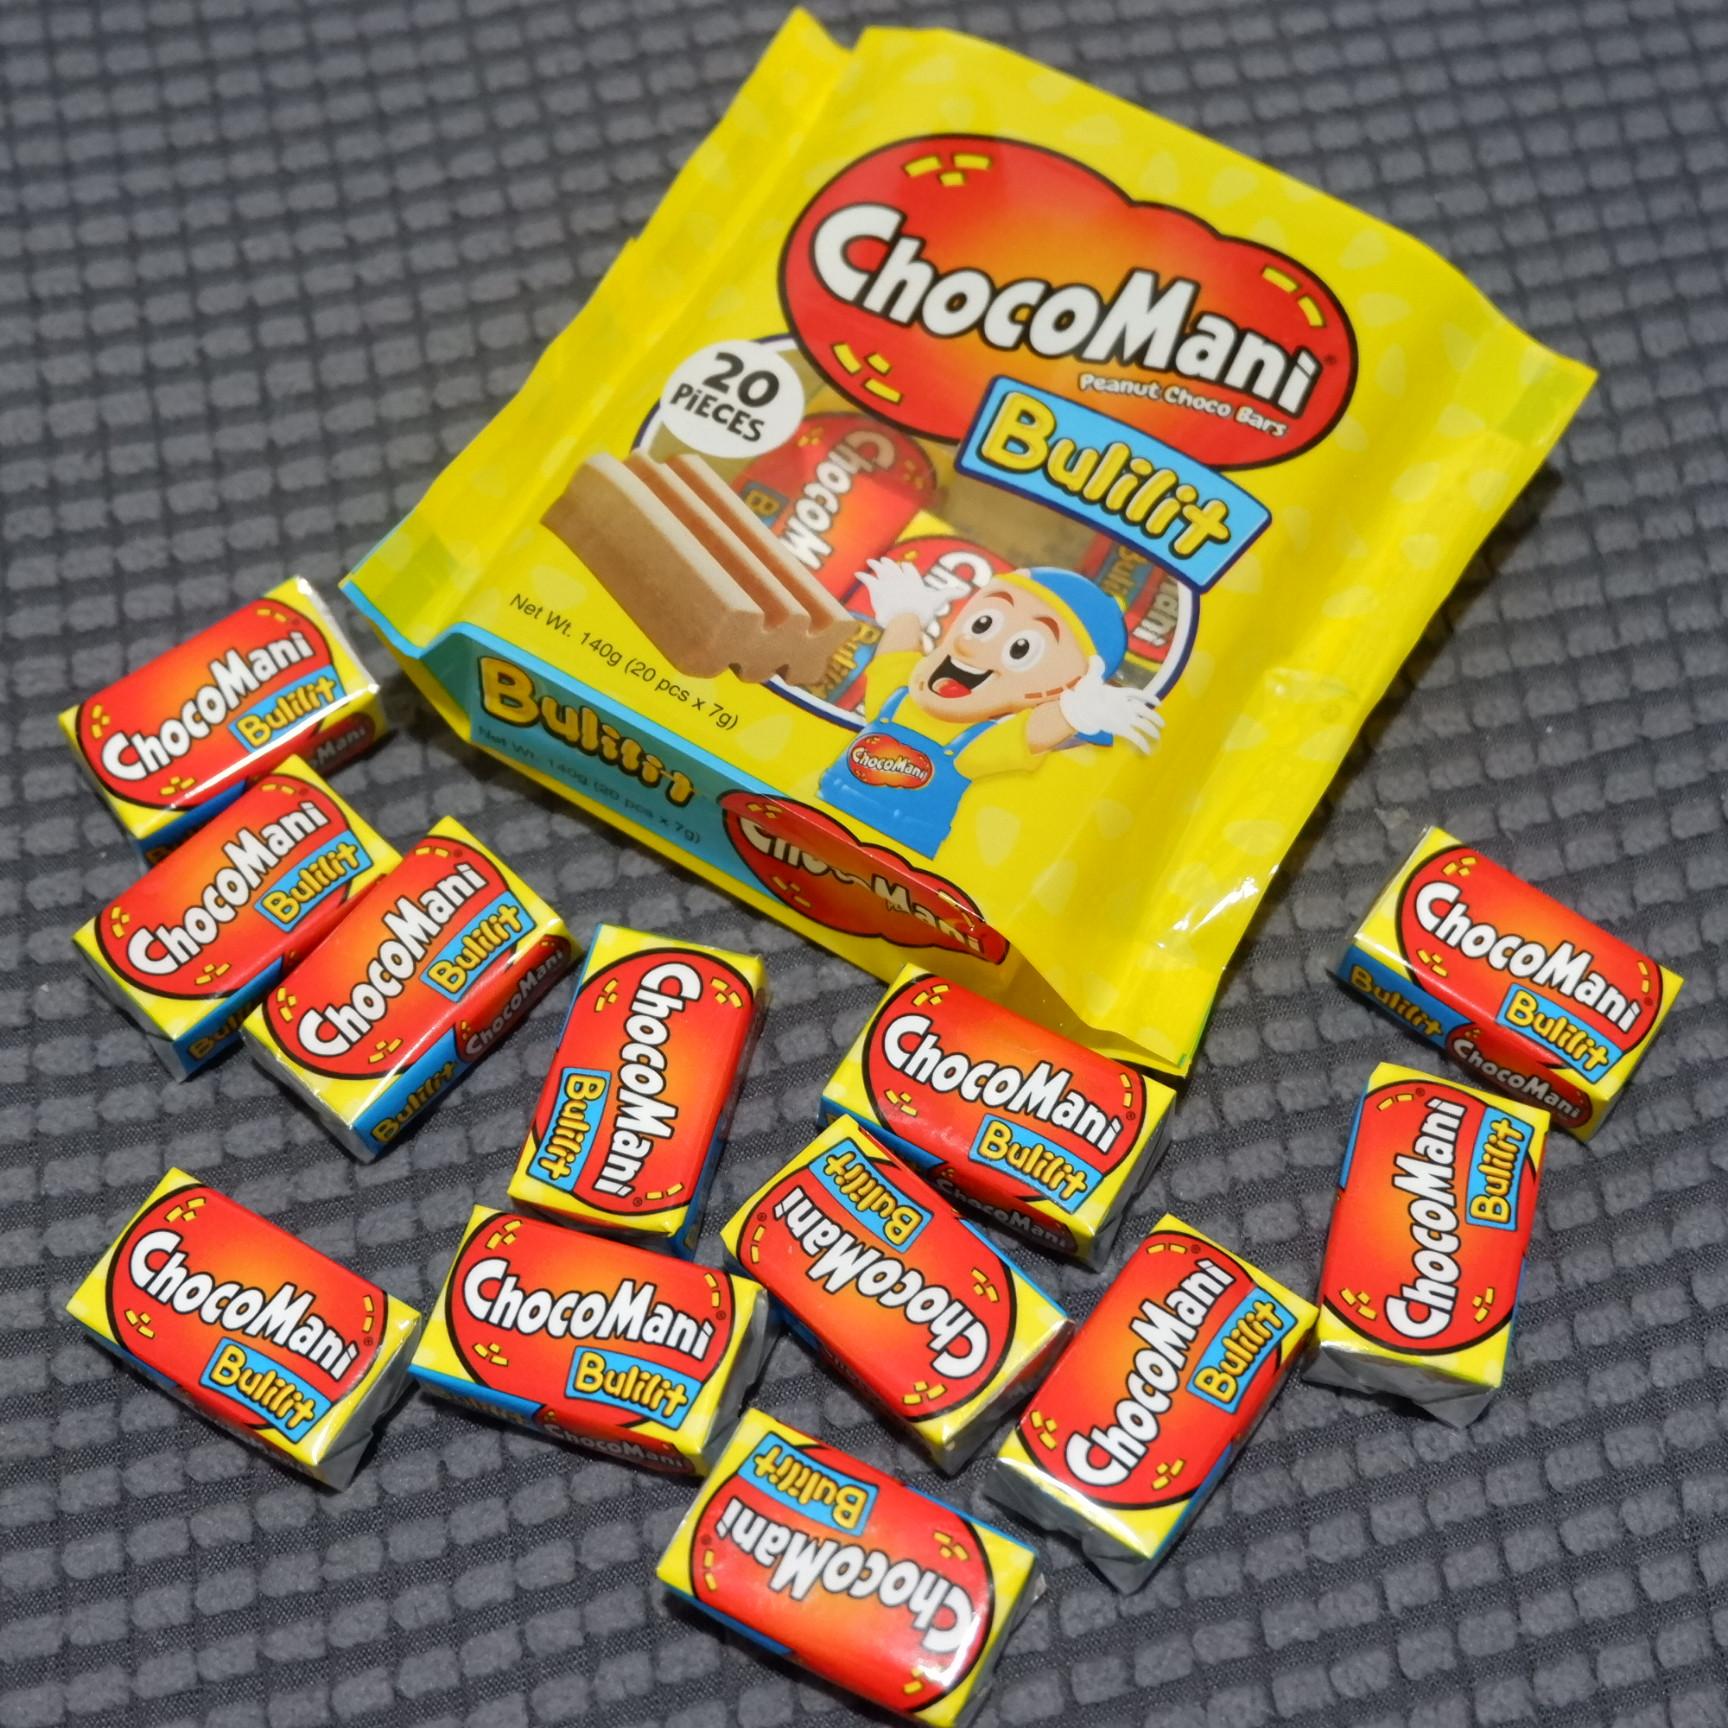 ChocoMani2